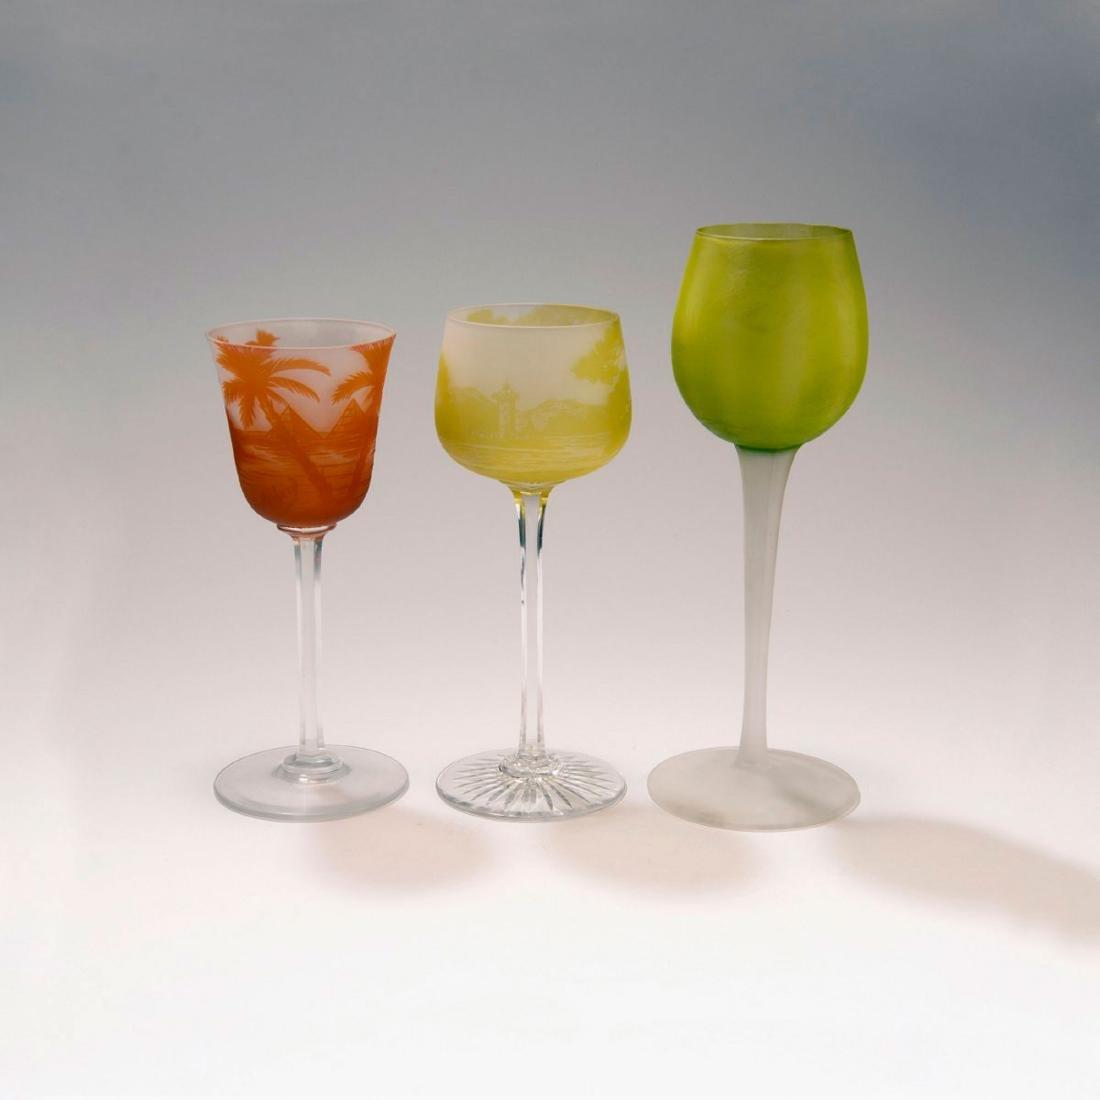 Three wine glasses, 1923-25